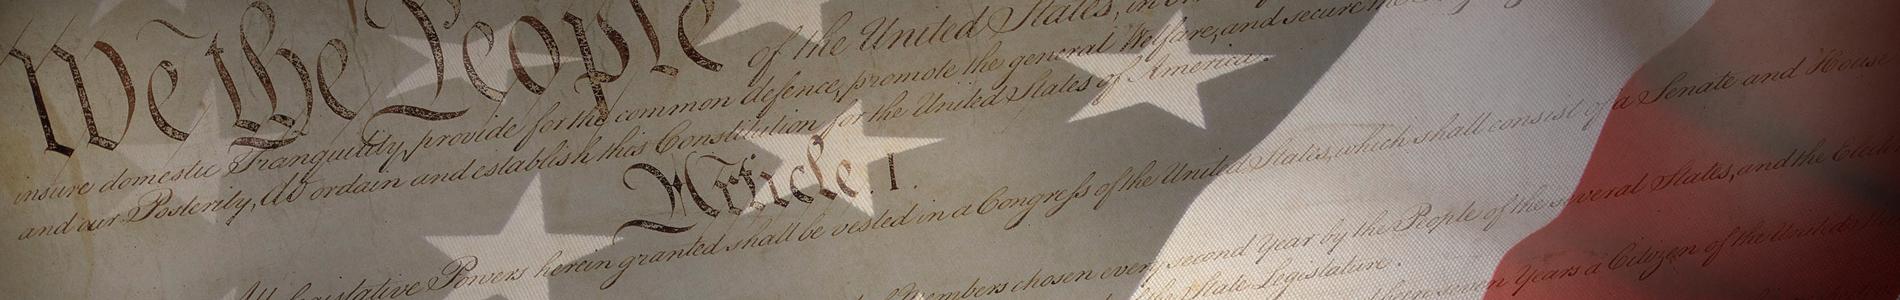 Constitution Week banner image